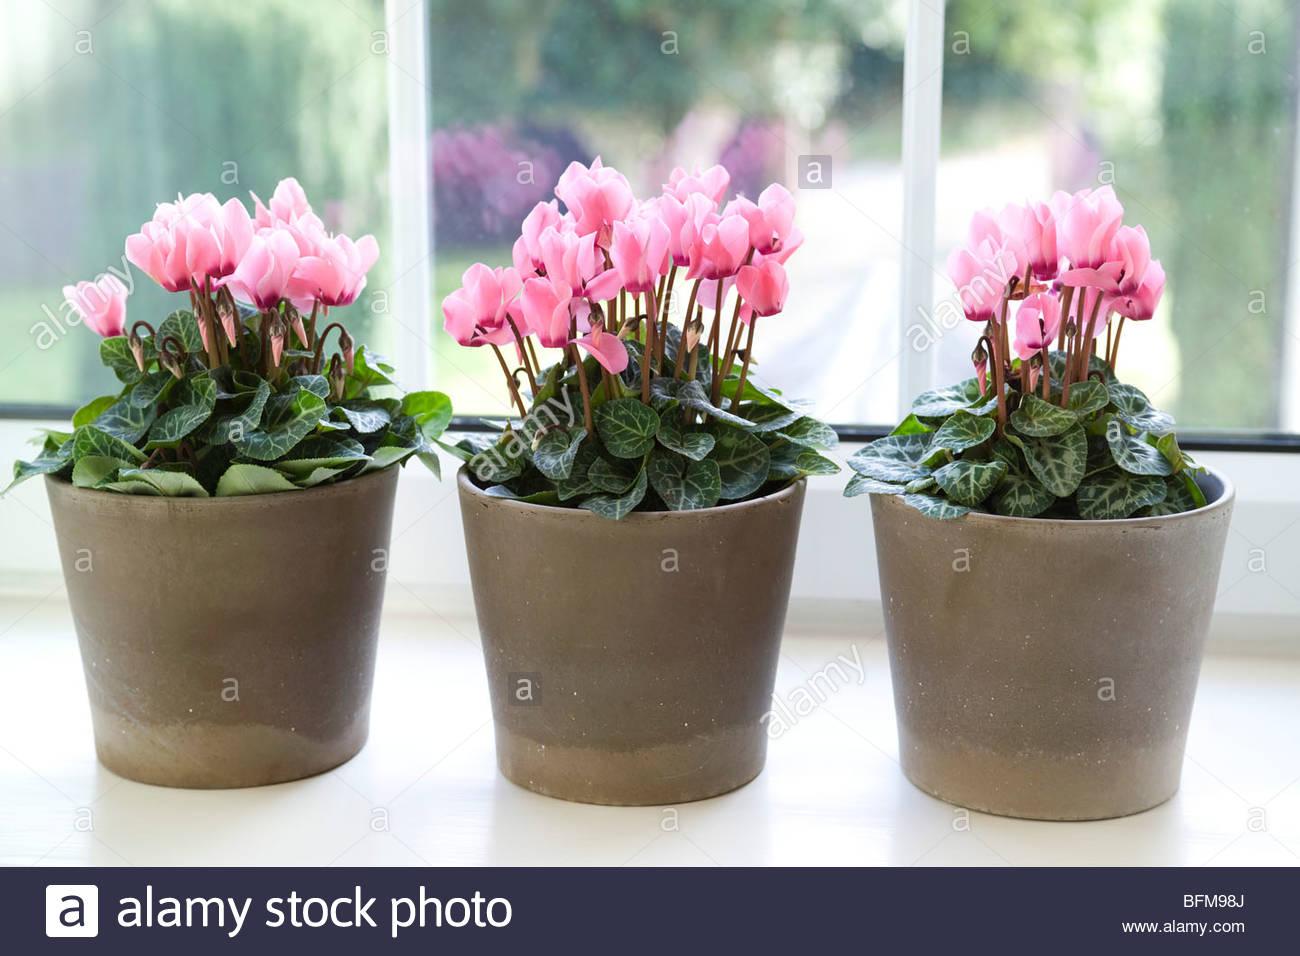 Pink Flowered Cyclamen Midi Persicum In Pots Stock Photo 26876546